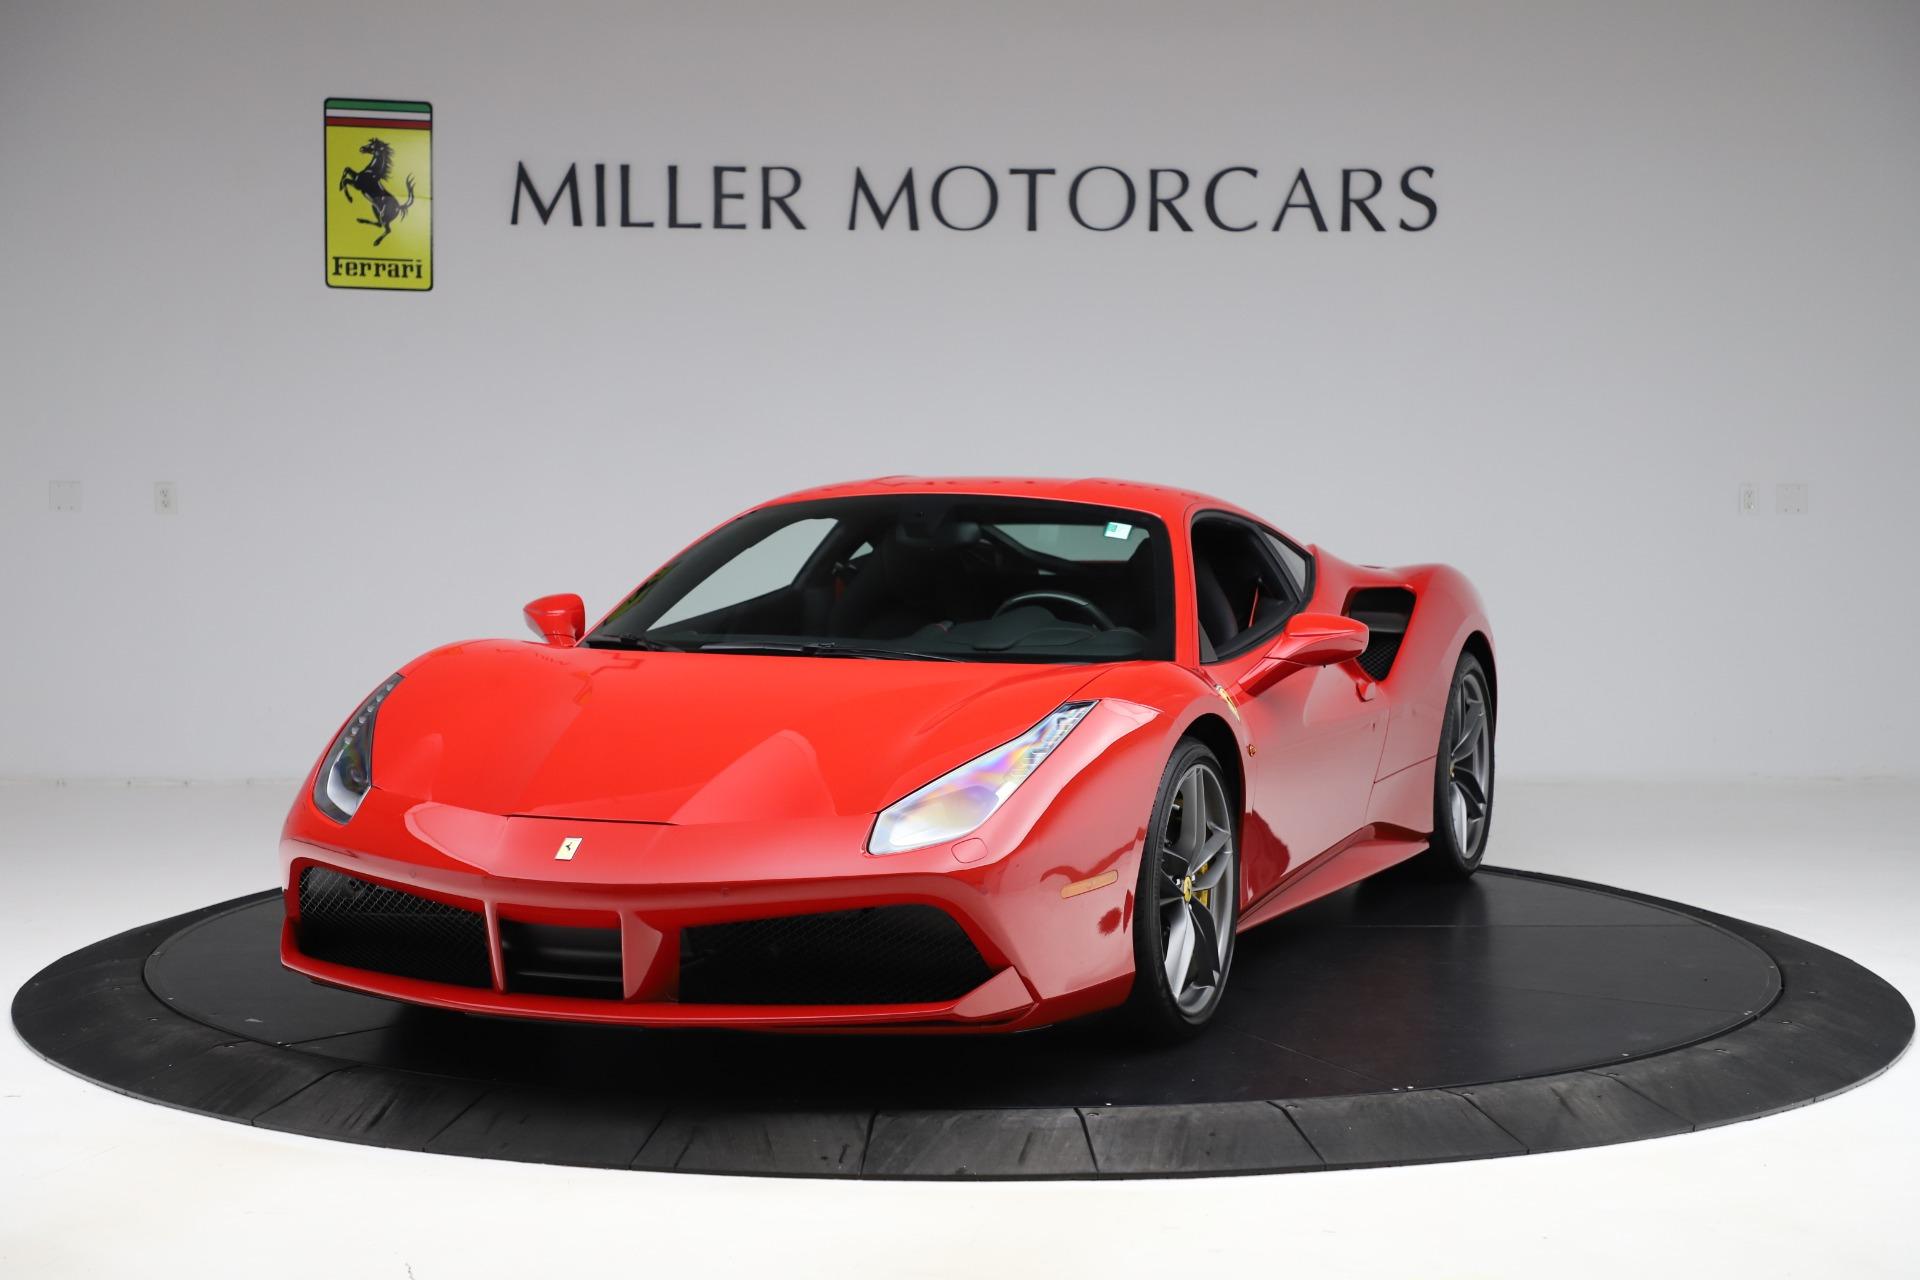 Used 2018 Ferrari 488 GTB for sale $242,900 at Aston Martin of Greenwich in Greenwich CT 06830 1